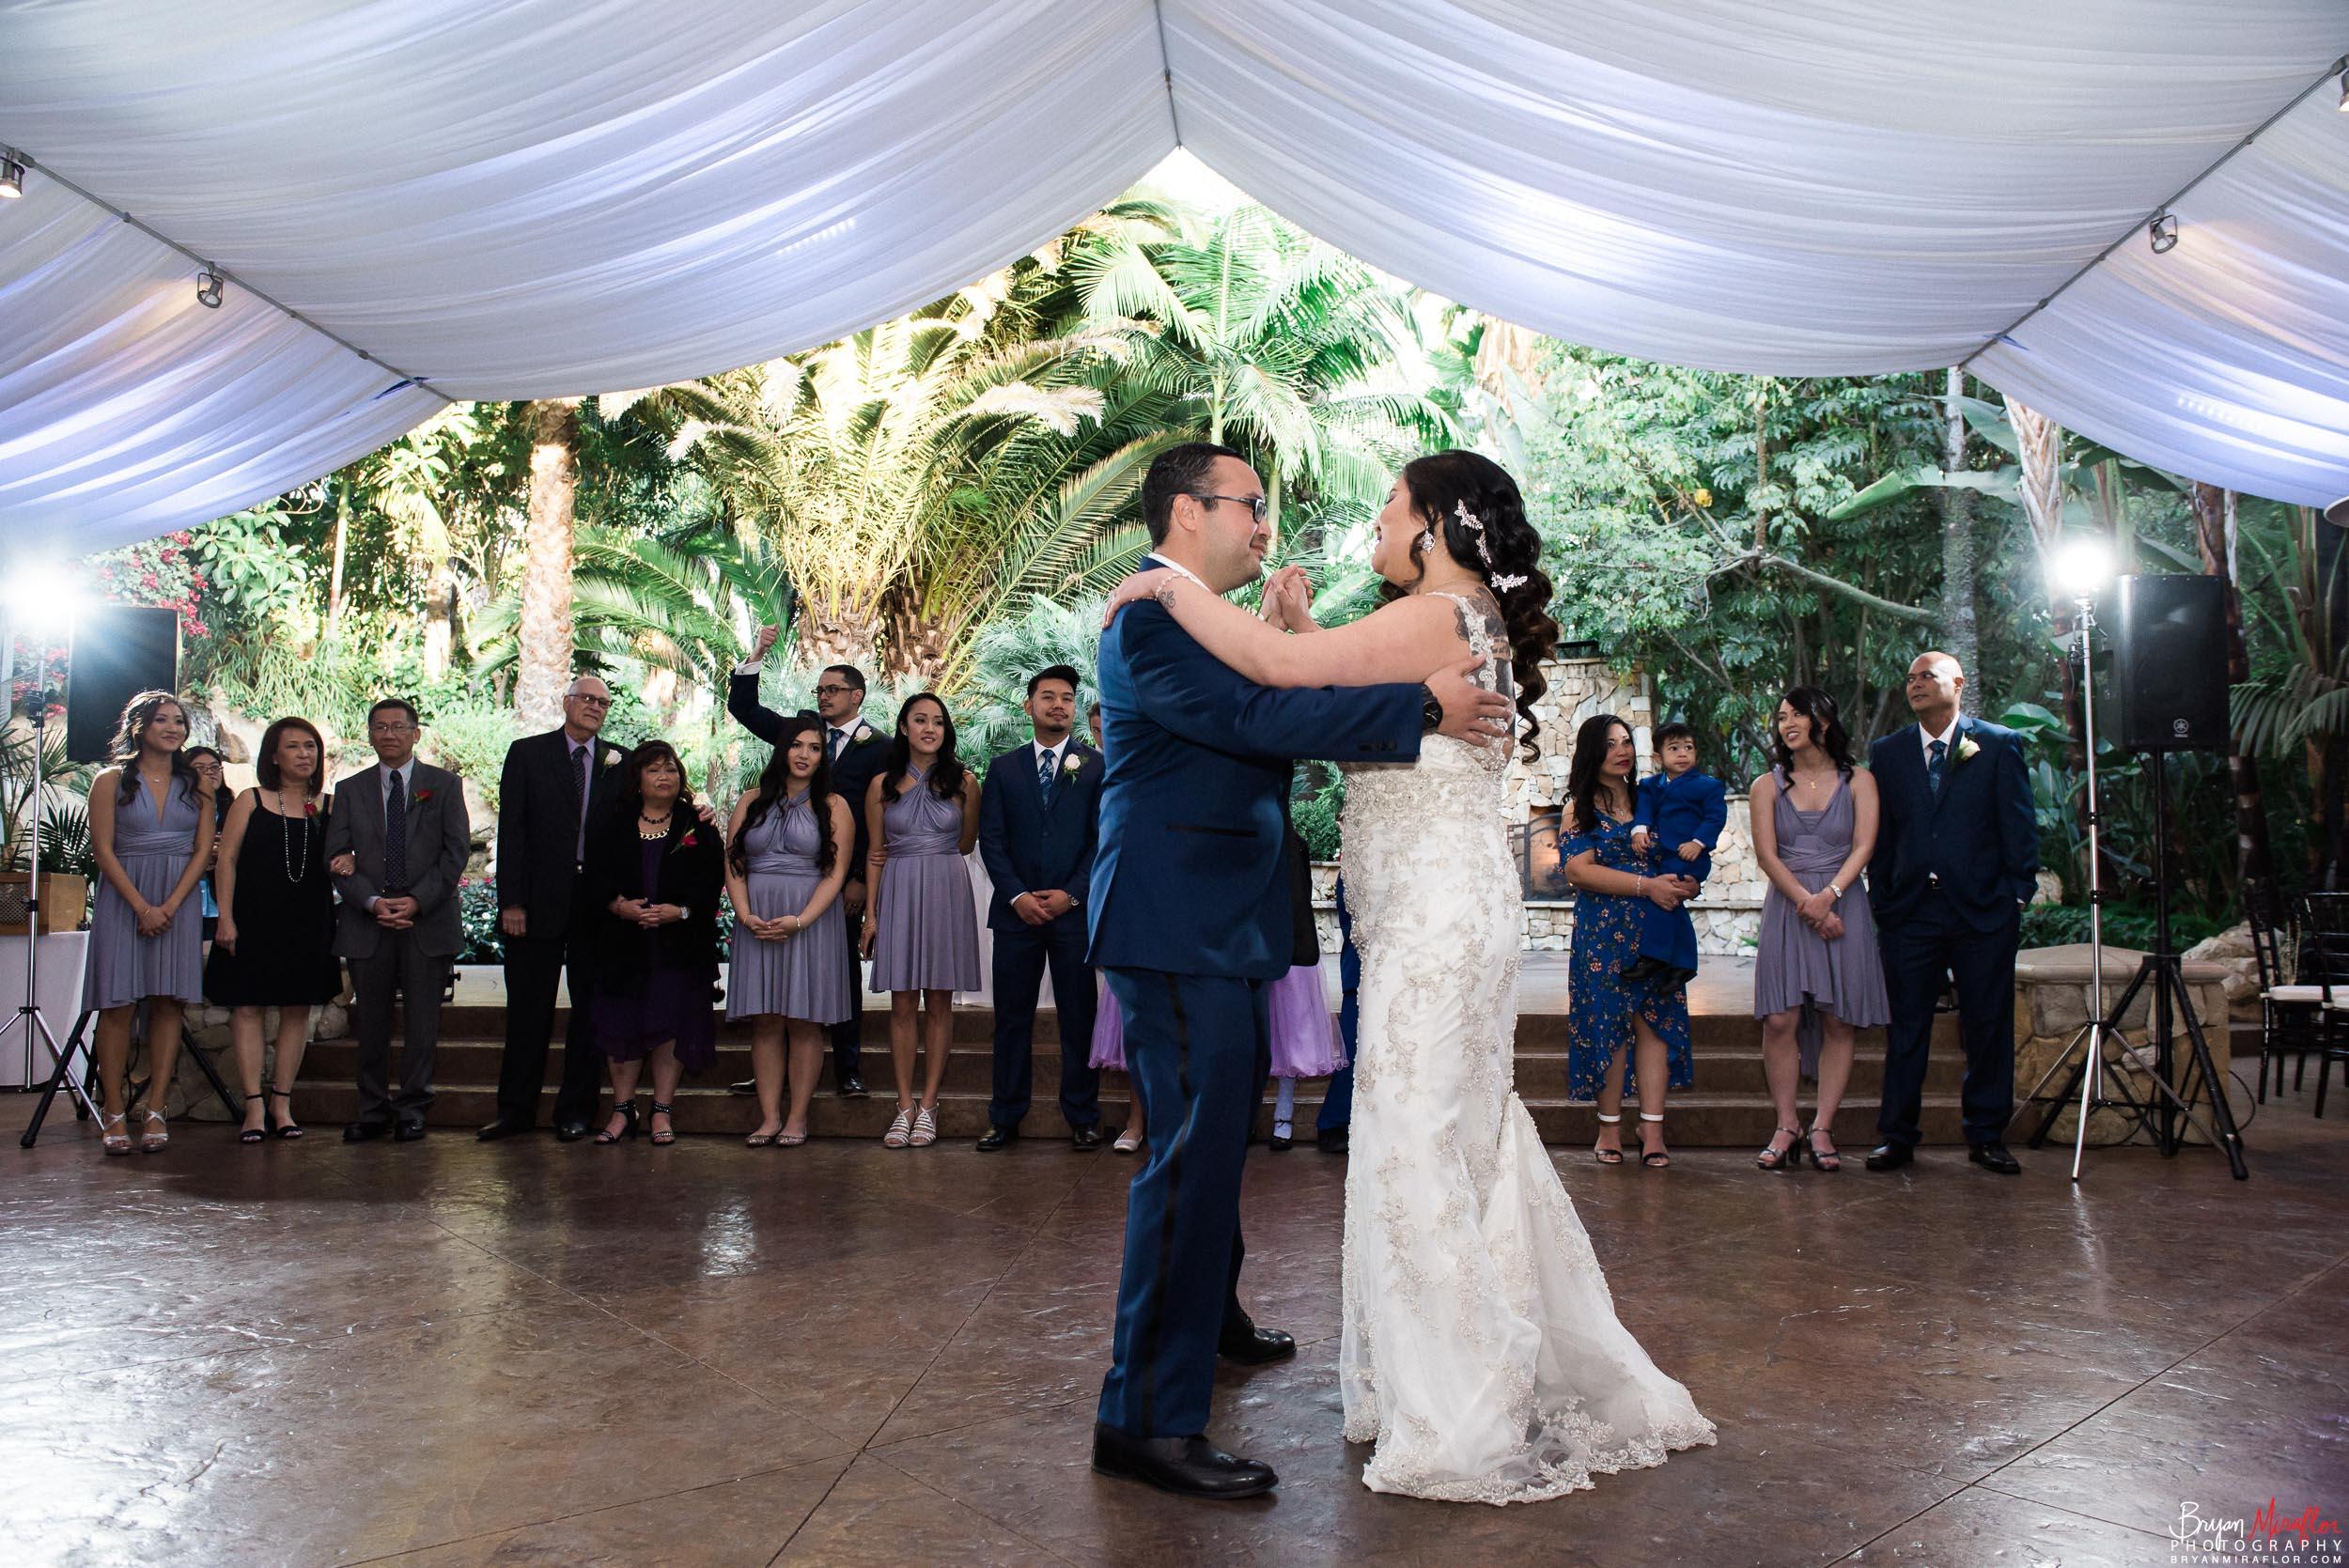 Bryan-Miraflor-Photography-Hannah-Jonathan-Married-Grand-Traditions-Estate-Gardens-Fallbrook-20171222-179.jpg